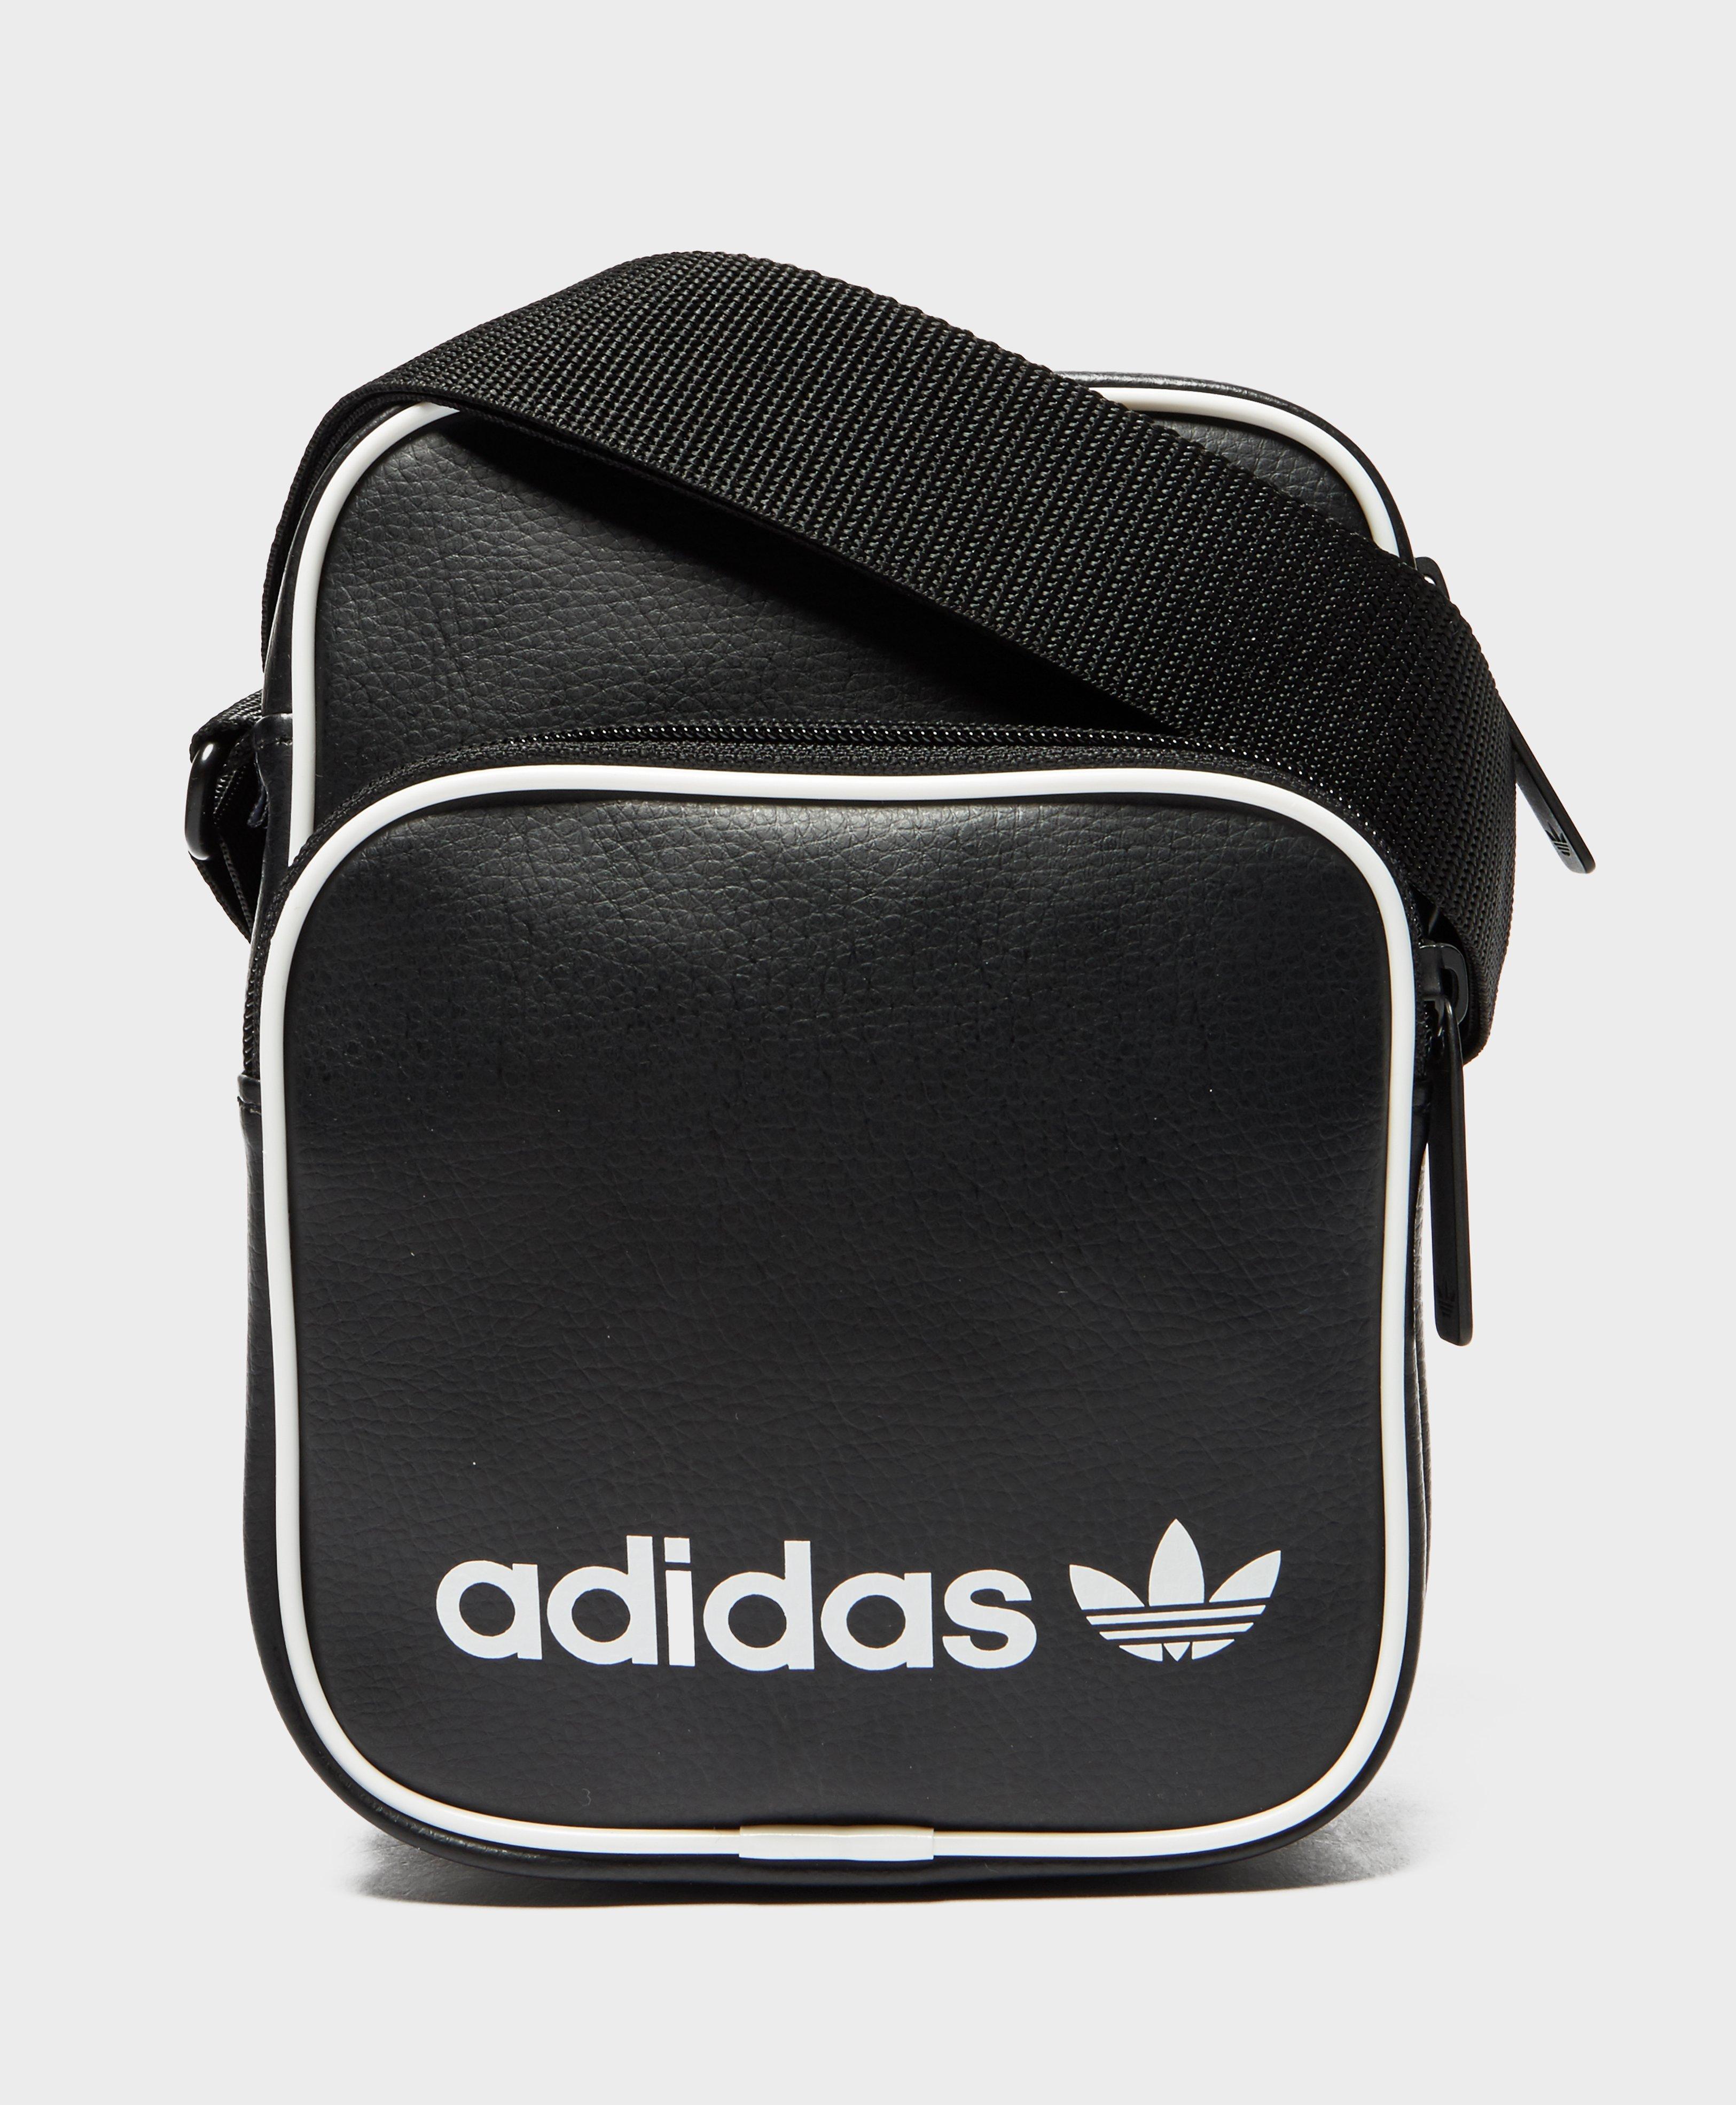 adidas Originals Cross Body Bag - Online Exclusive in Black for Men ... f578d0aeb01fa